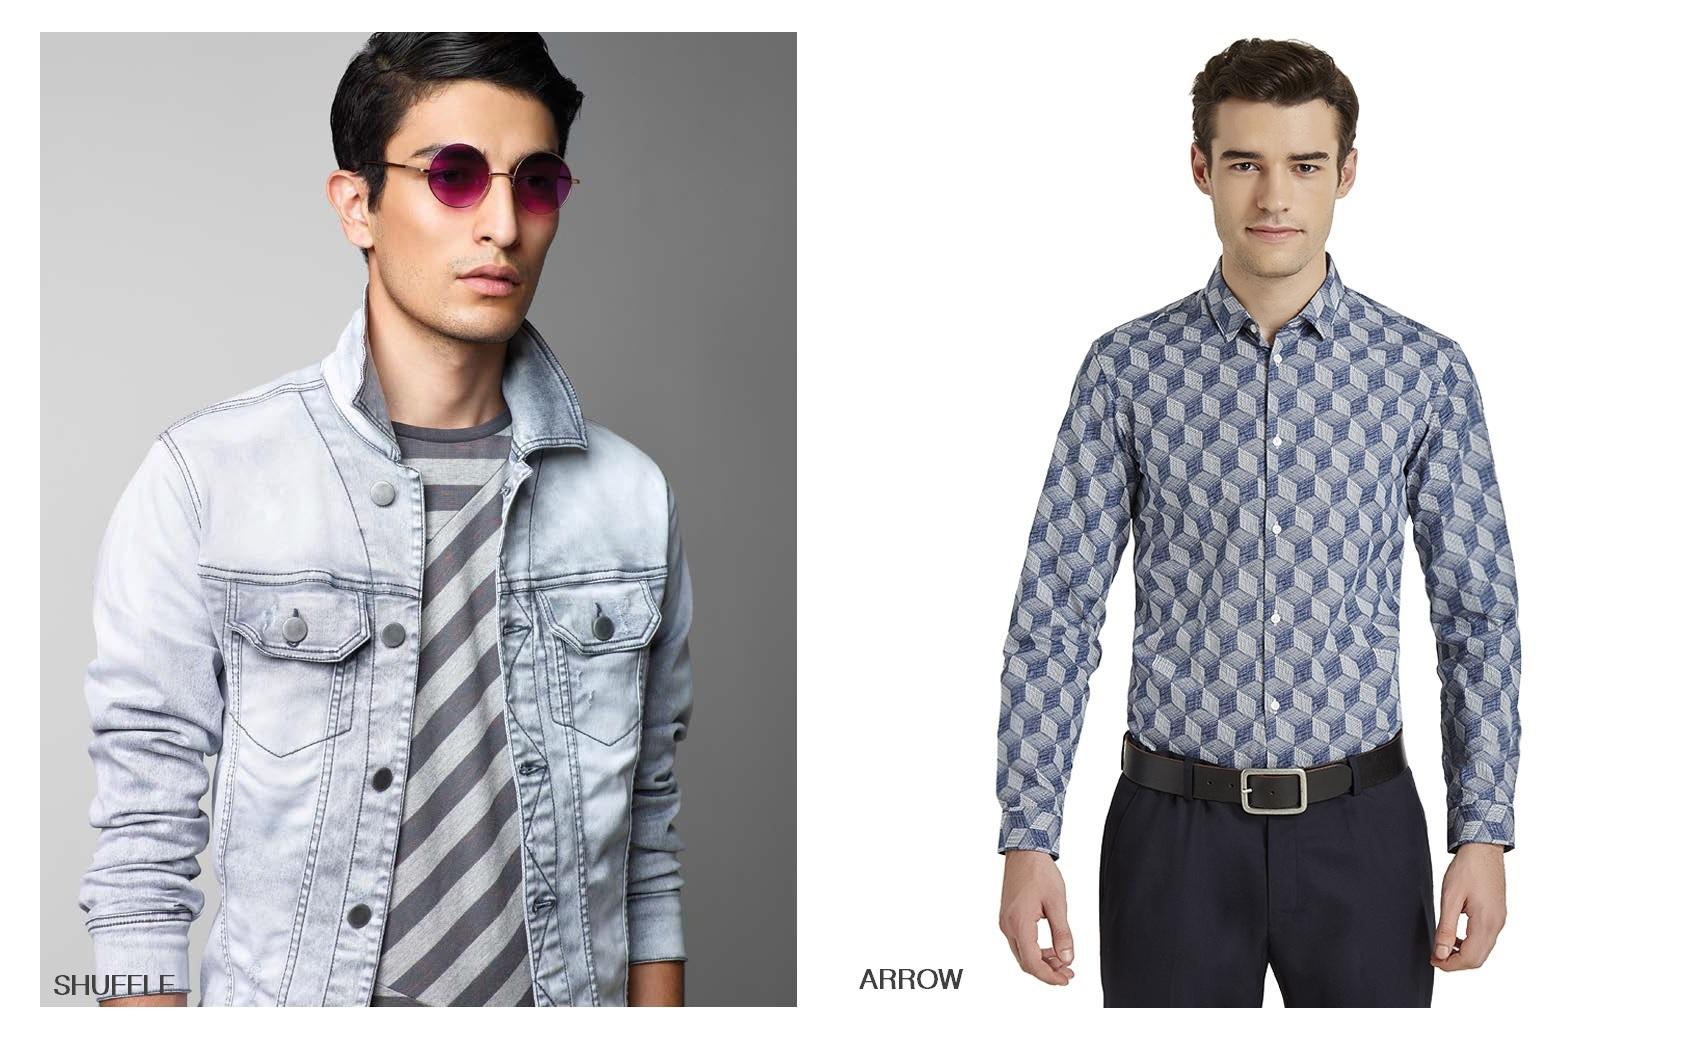 men_prints_invertedtriangle_fashion_style